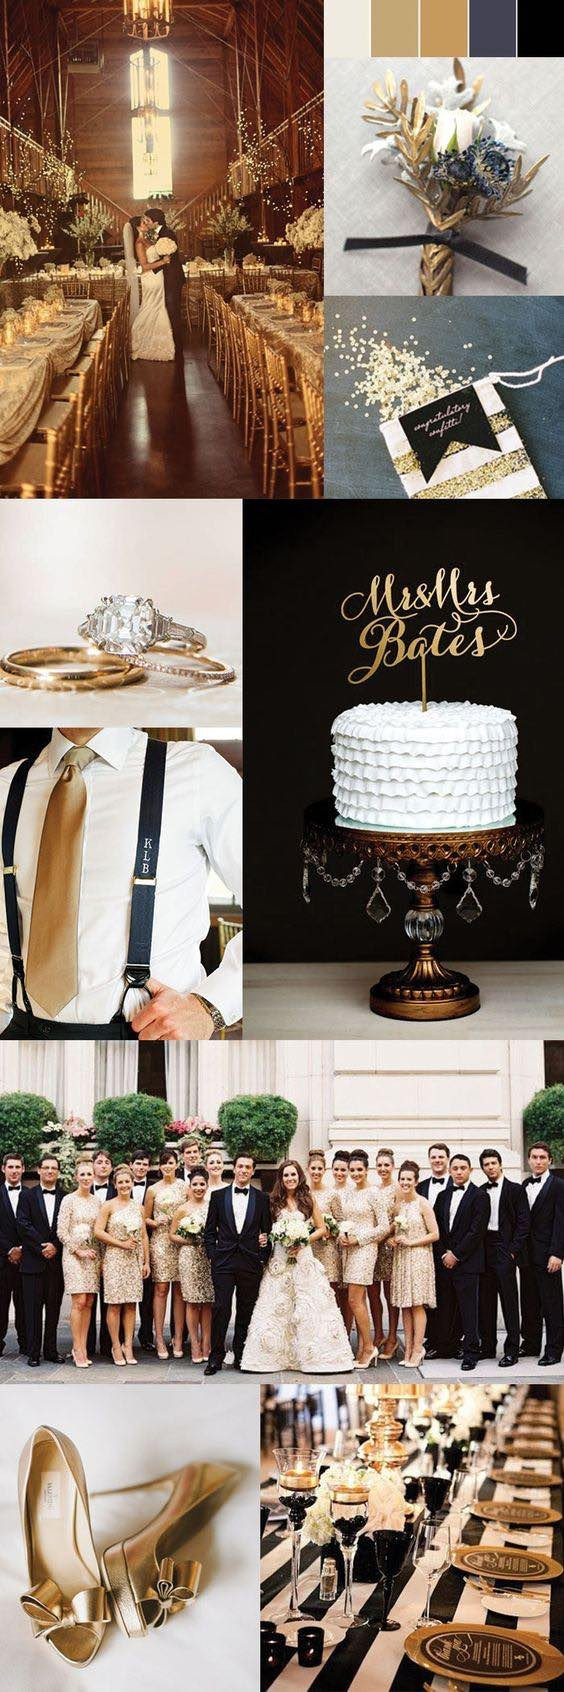 Black and Gold Wedding Decor Best Of 50 Tren St Gold Wedding Ideas